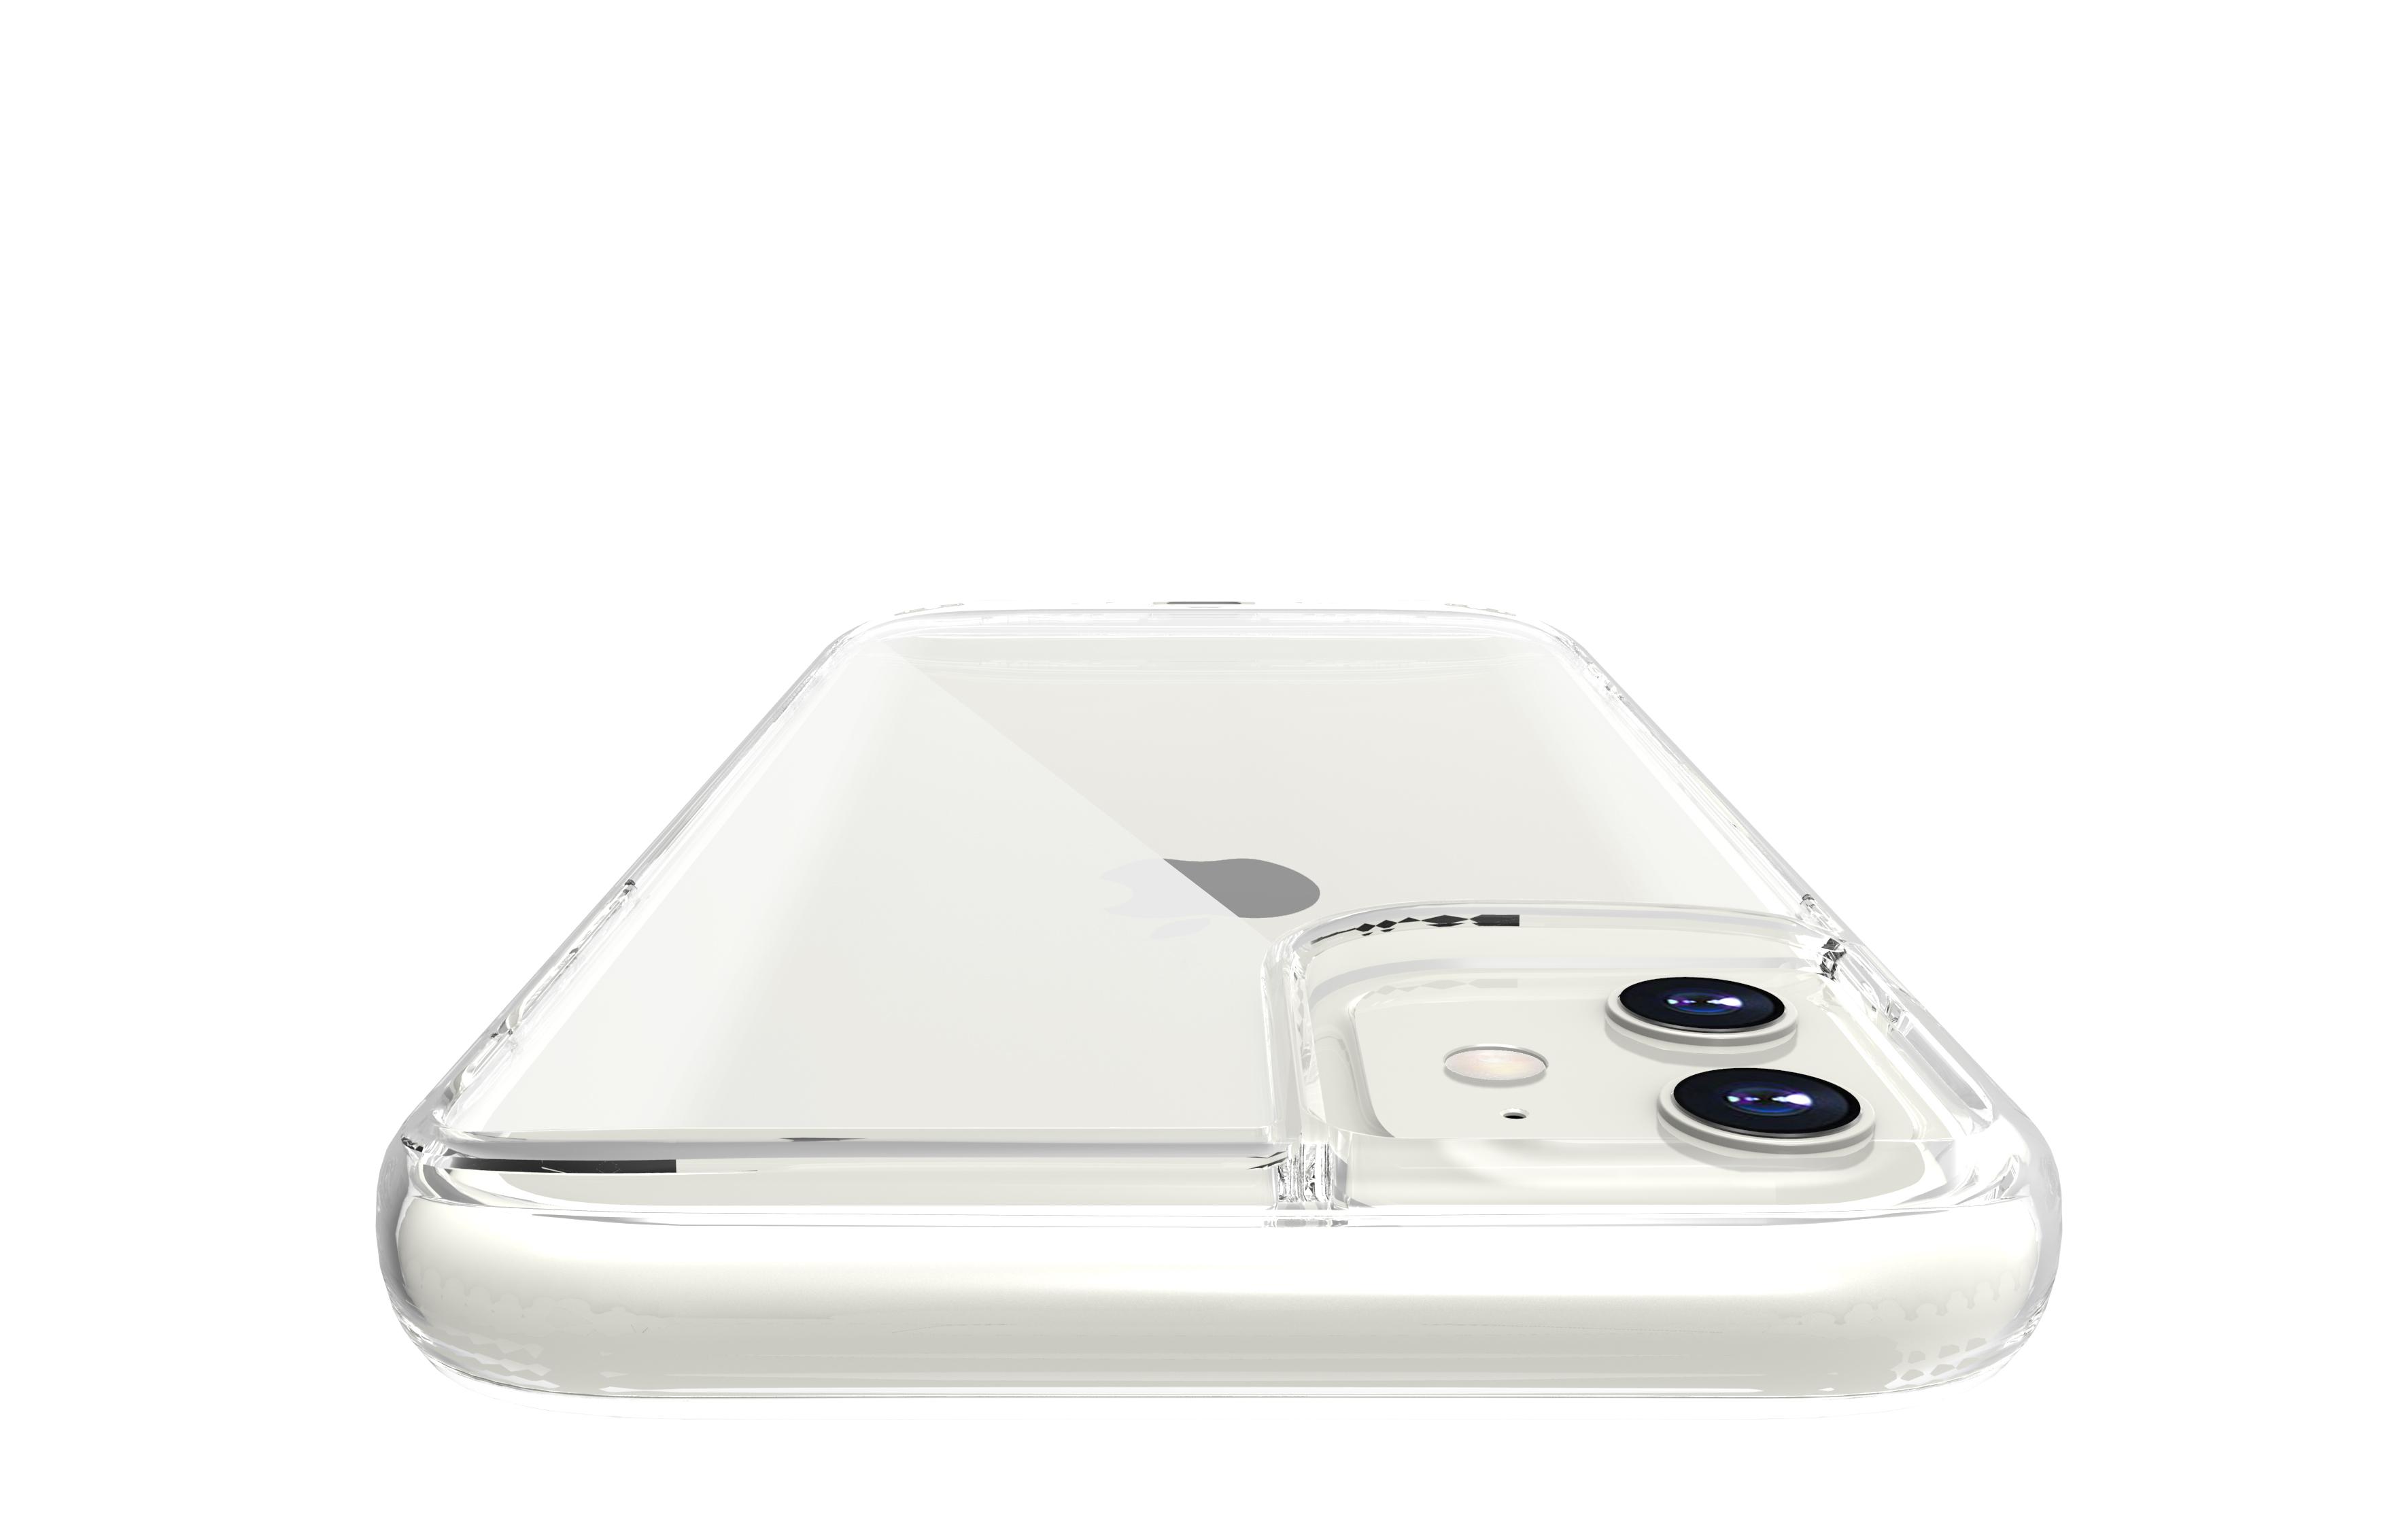 iPhone11-White for linkase pro ADM